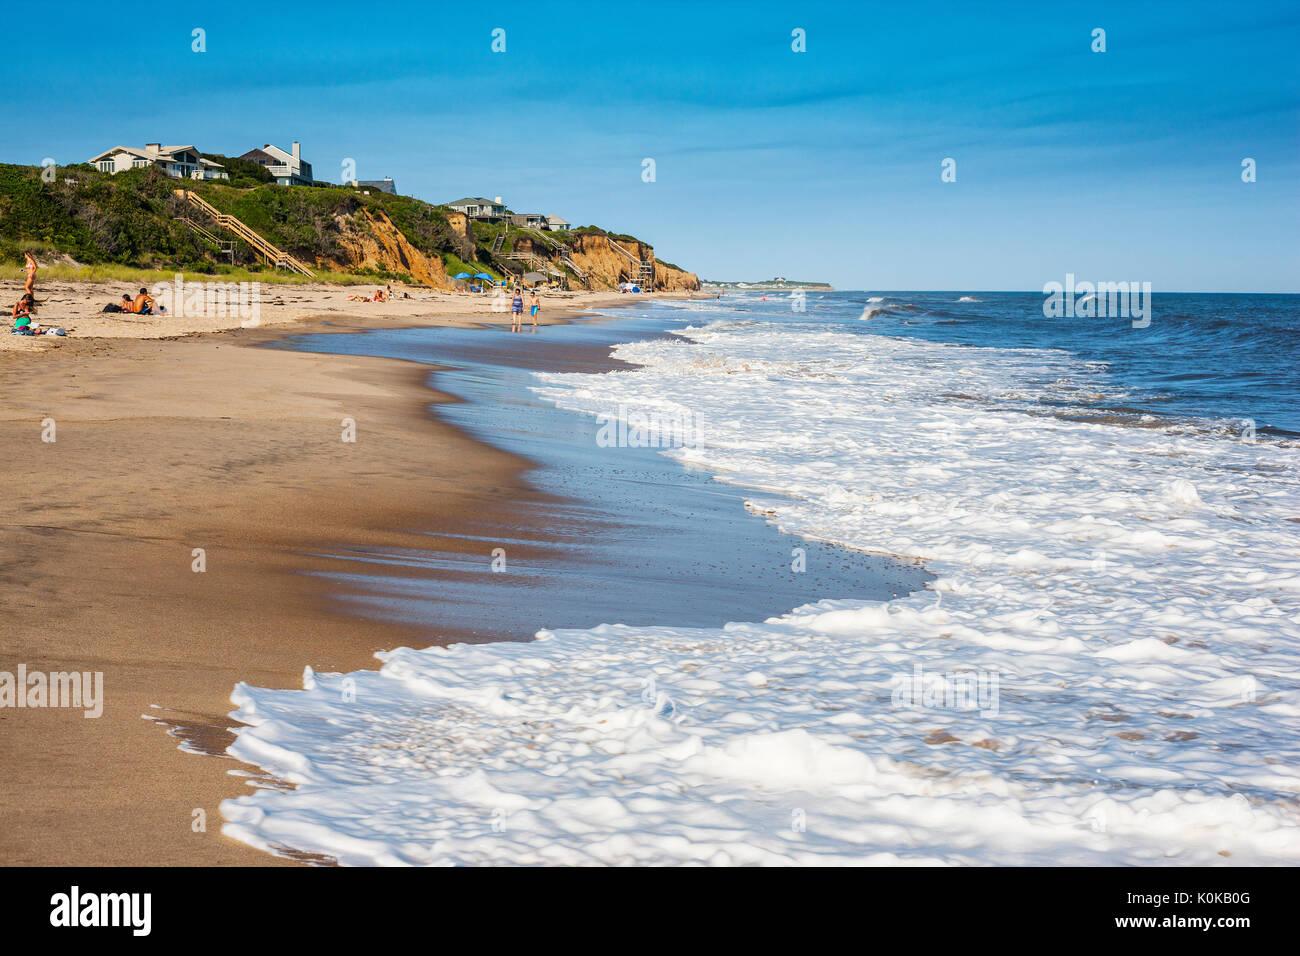 Montauk beach, Long Island - Stock Image